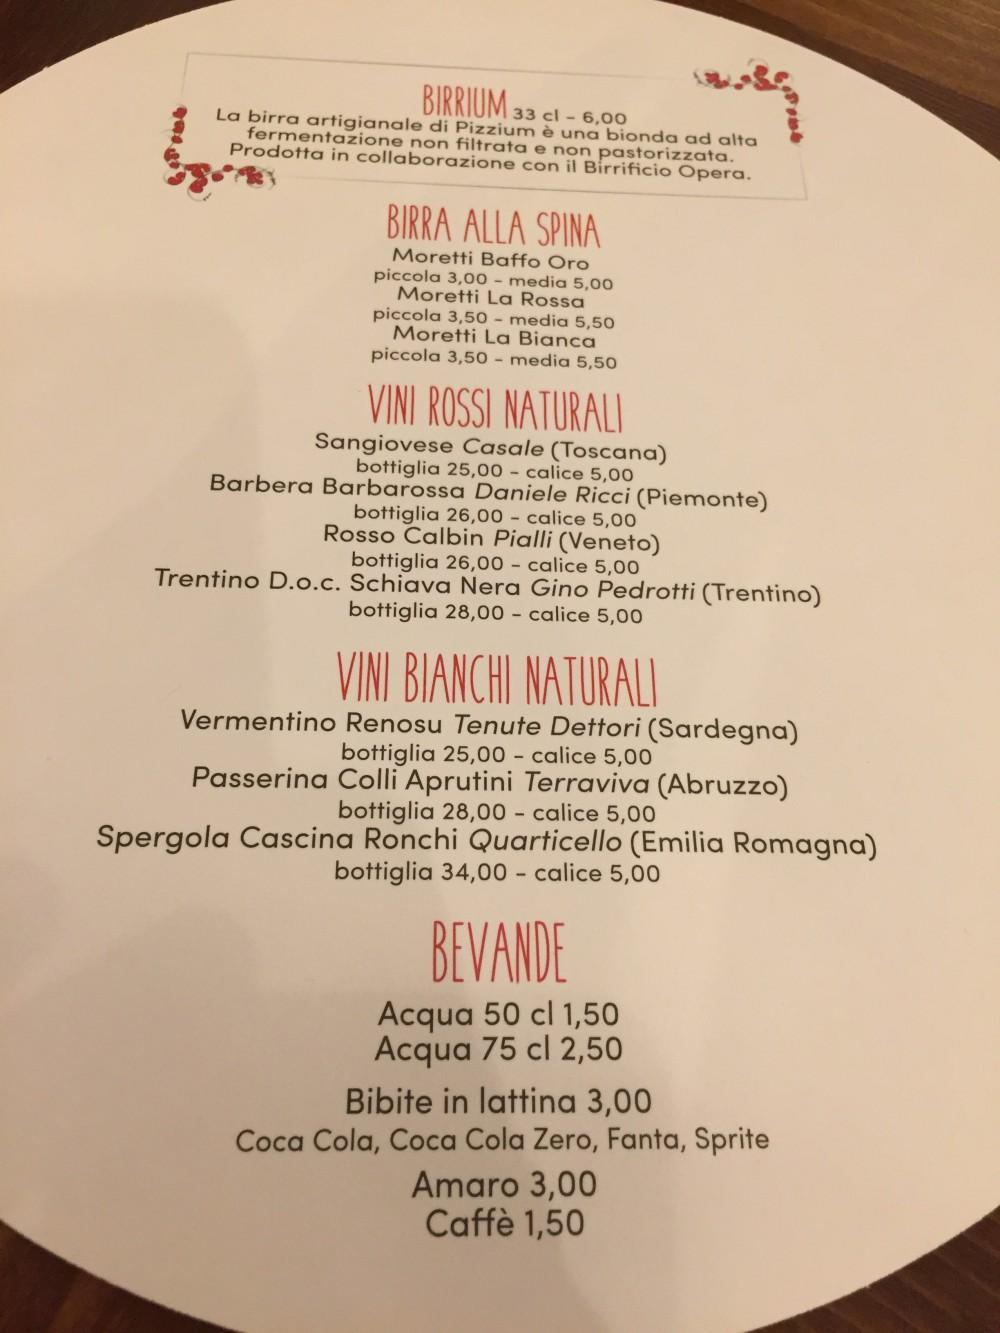 Pizzium, Milano - Menu'